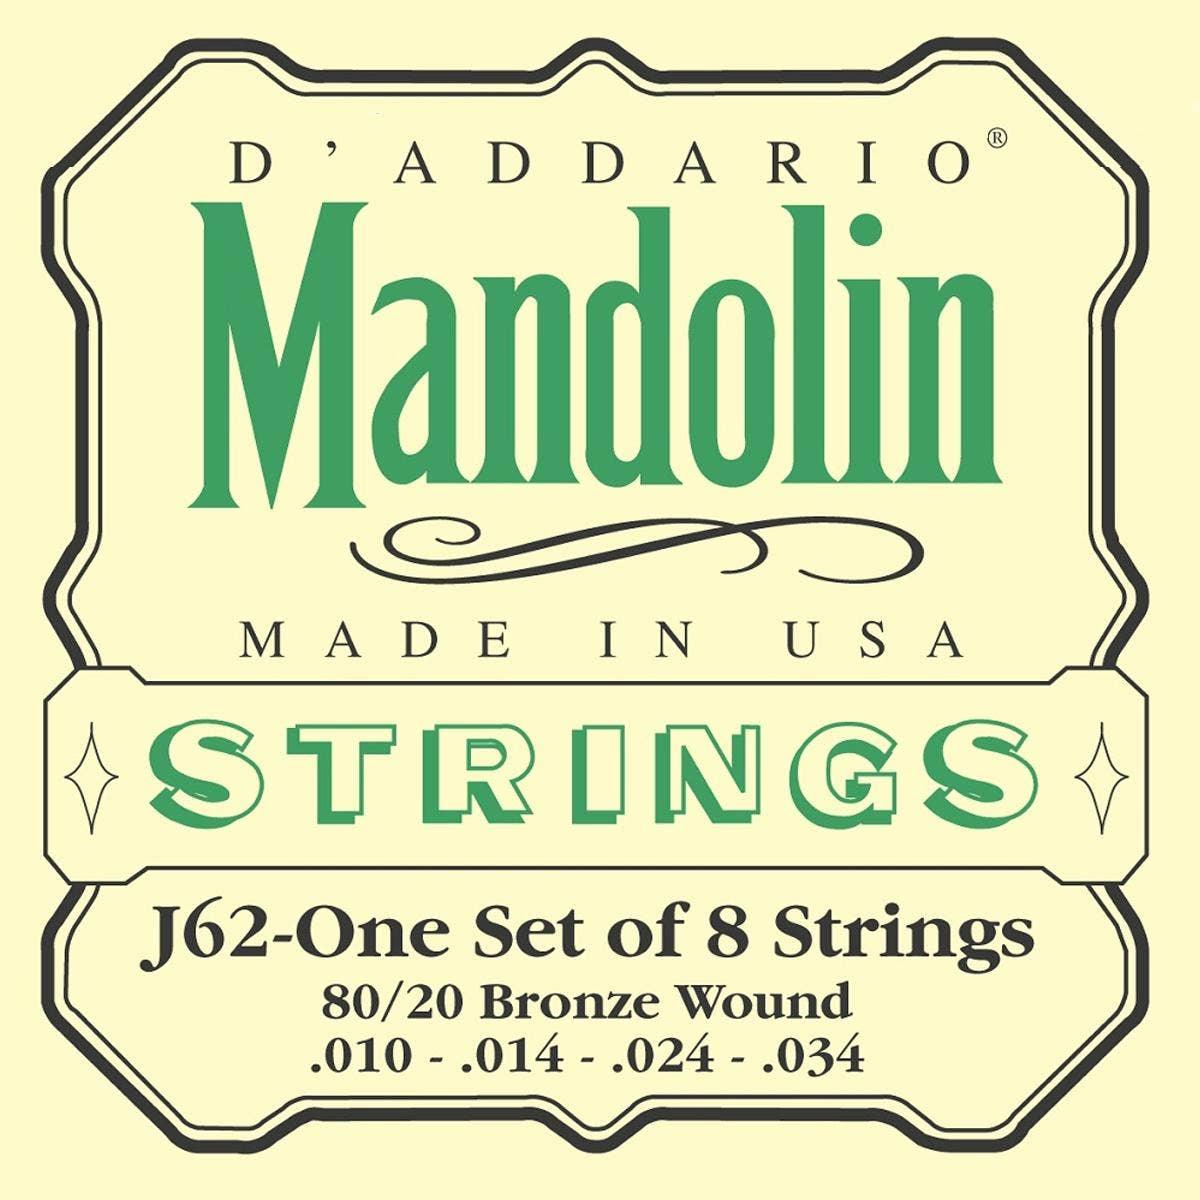 D'Addario J62 Light 80/20 Bronze Mandolin Strings (10-34) for sale